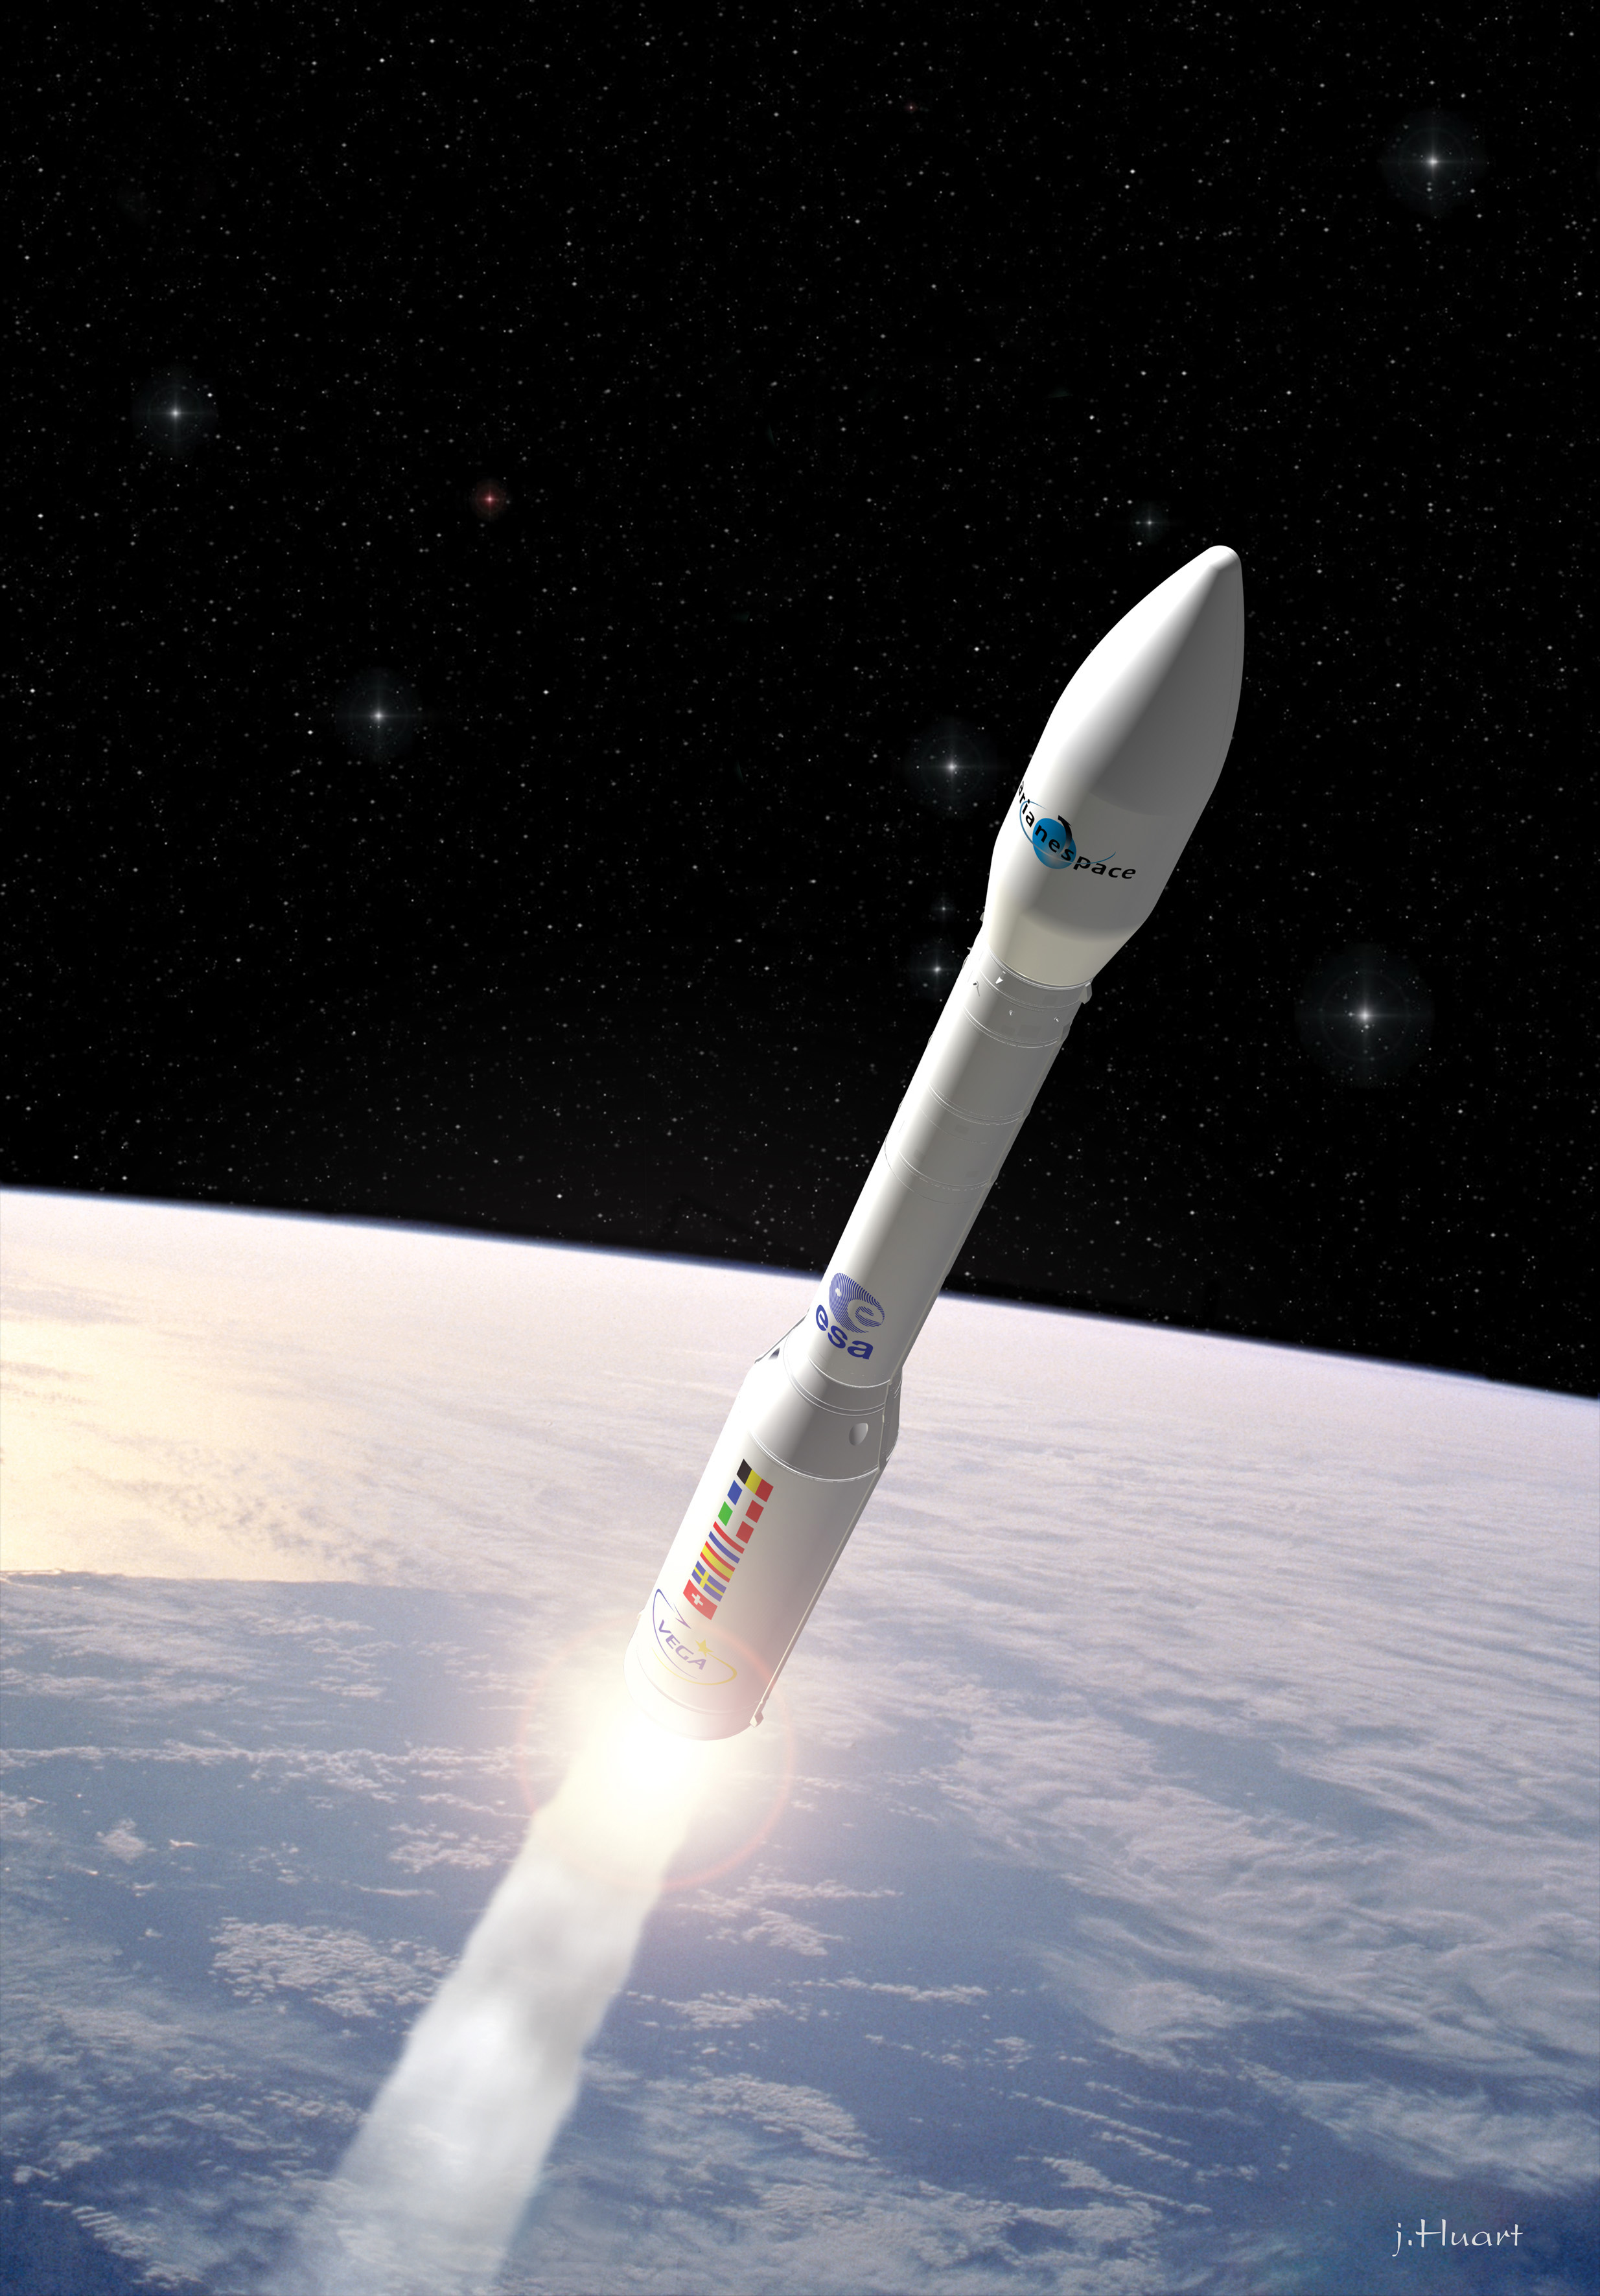 Esa Vega - Pics about space